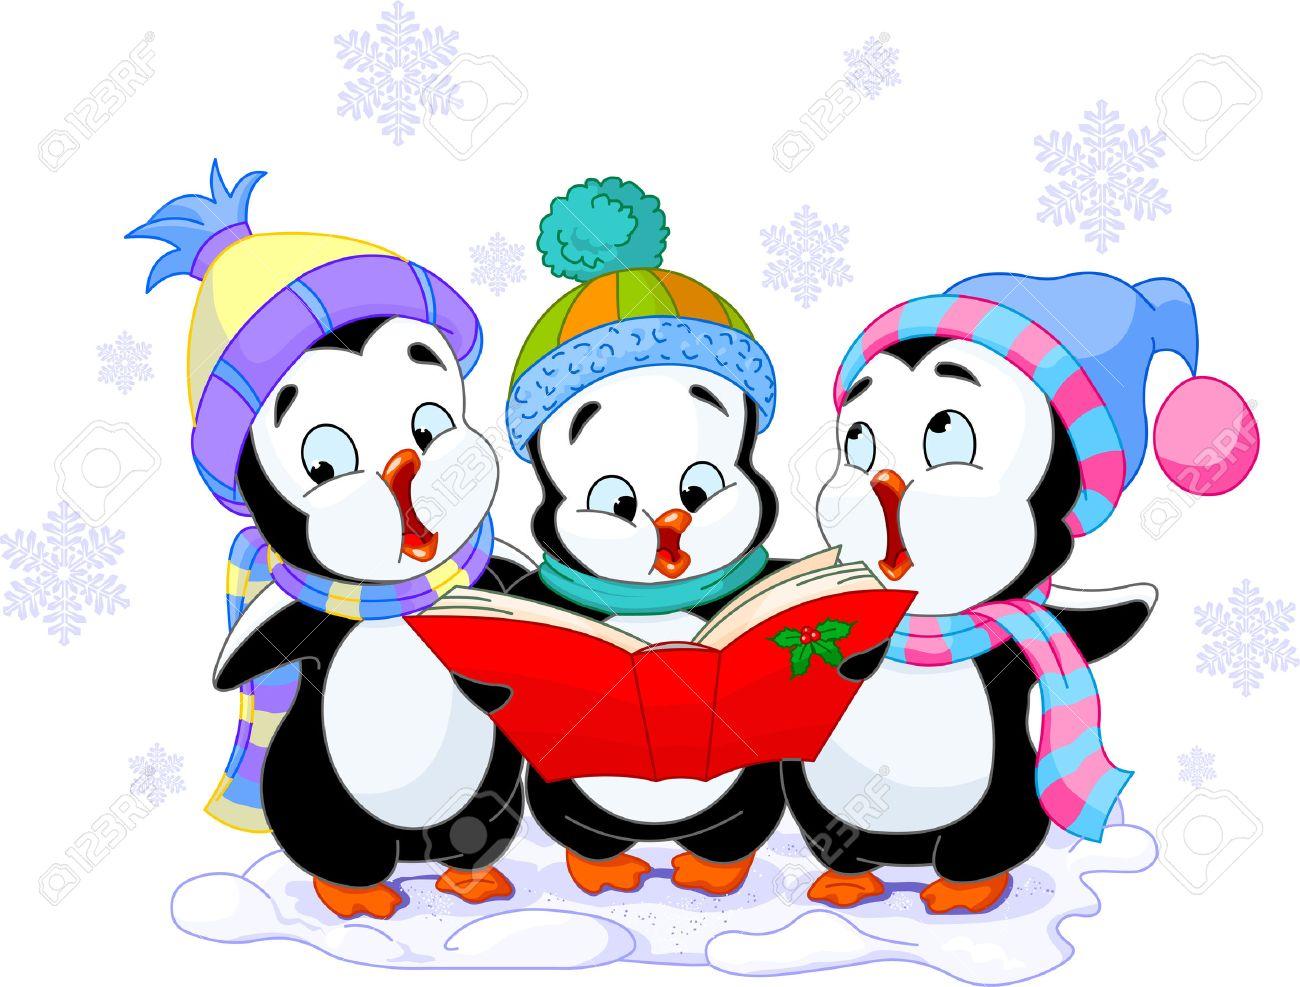 1300x987 Cute Cartoon Penguins Singing Christmas Carols Royalty Free